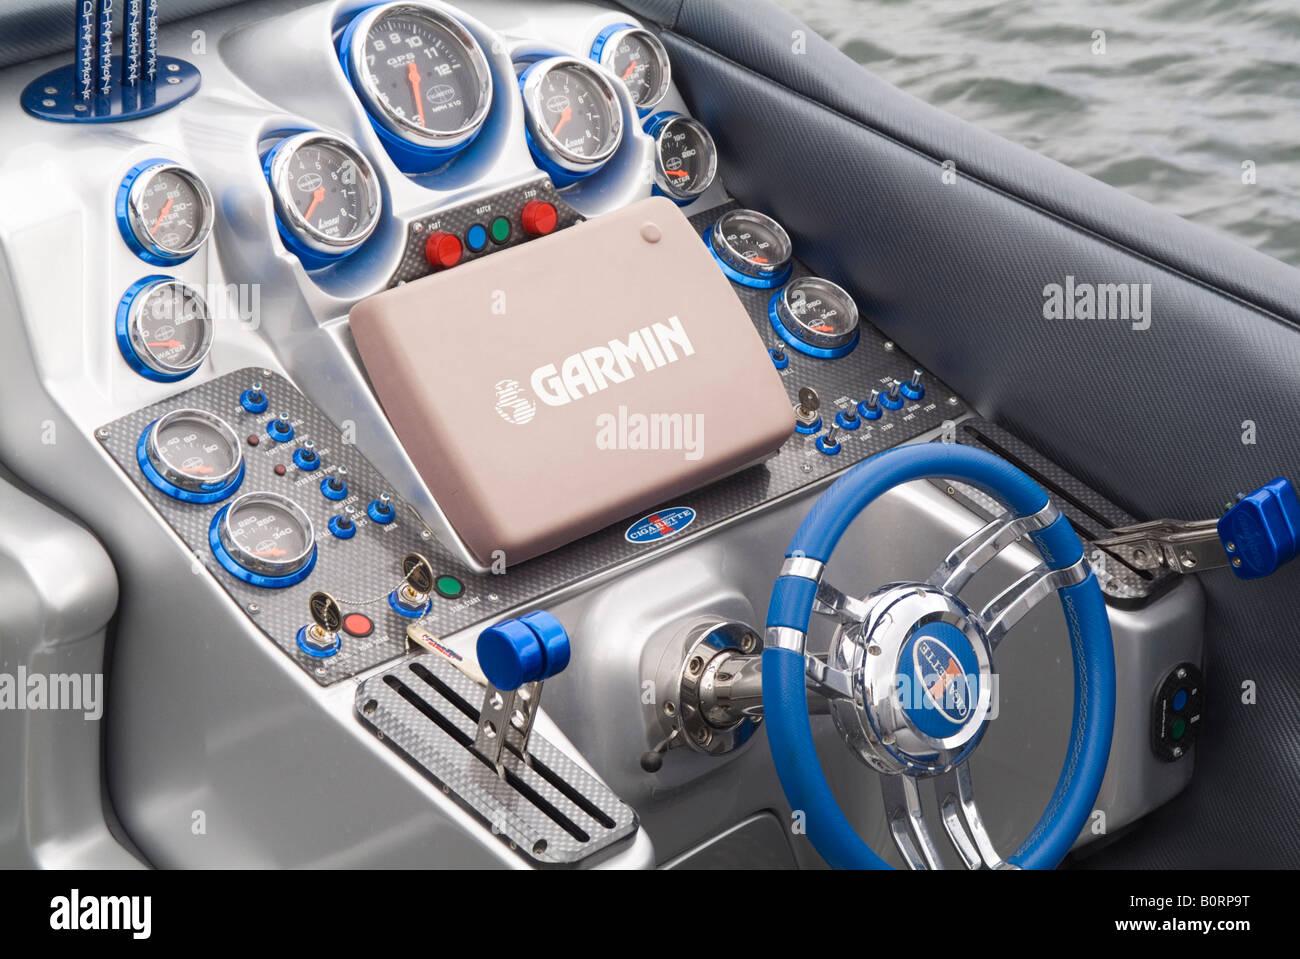 Speedboat Cockpit Wheel Gauges Garmin Gps Sat Nav